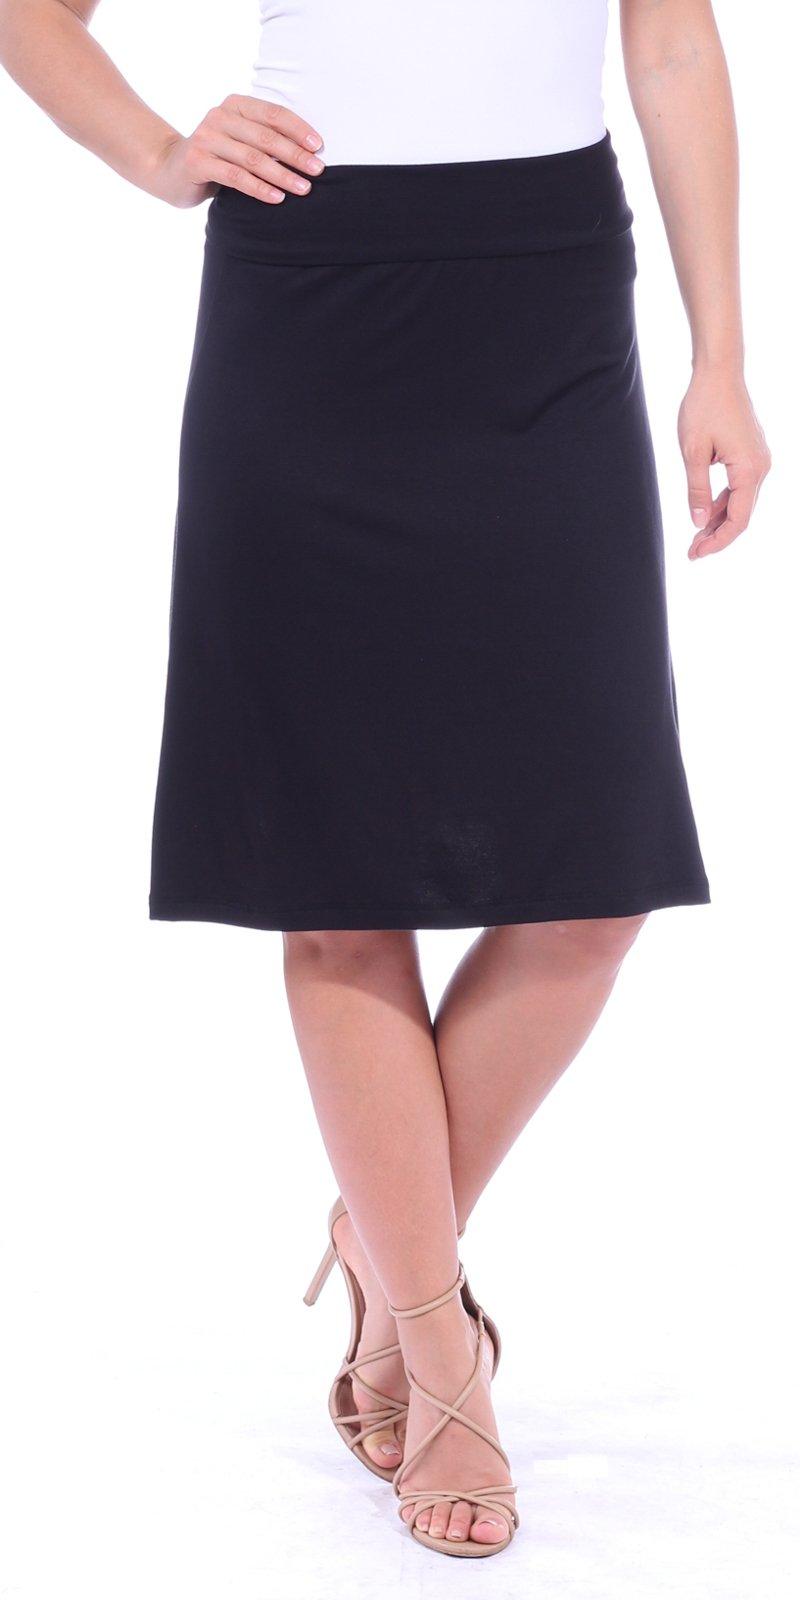 Popana Women's Casual Stretch Midi Knee Length Short Summer Skirt - Made in USA Medium Black